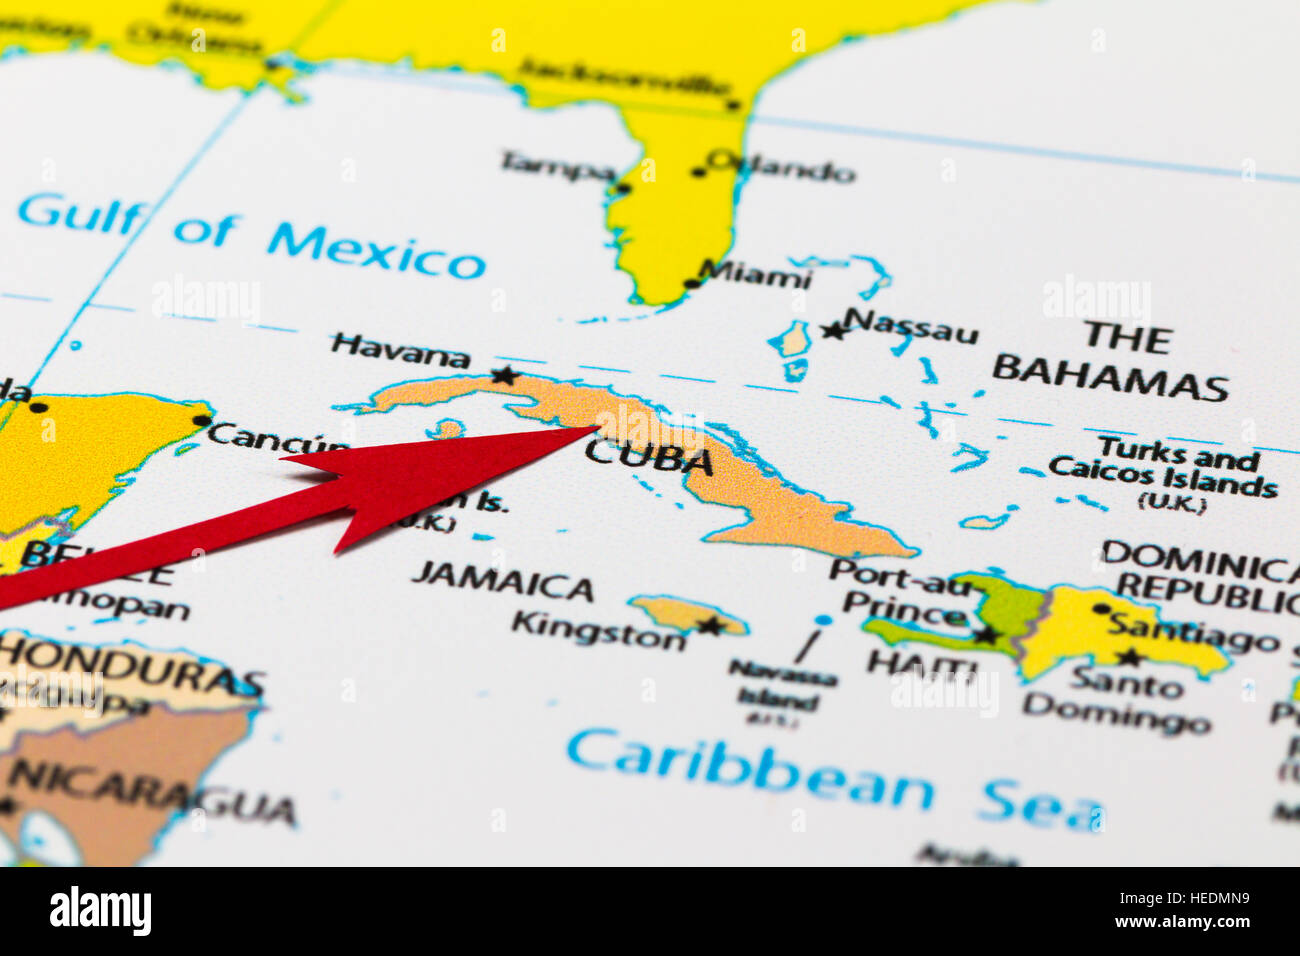 Florida Karte Drucken.Kuba Karte Drucken Stockfotos Kuba Karte Drucken Bilder Alamy